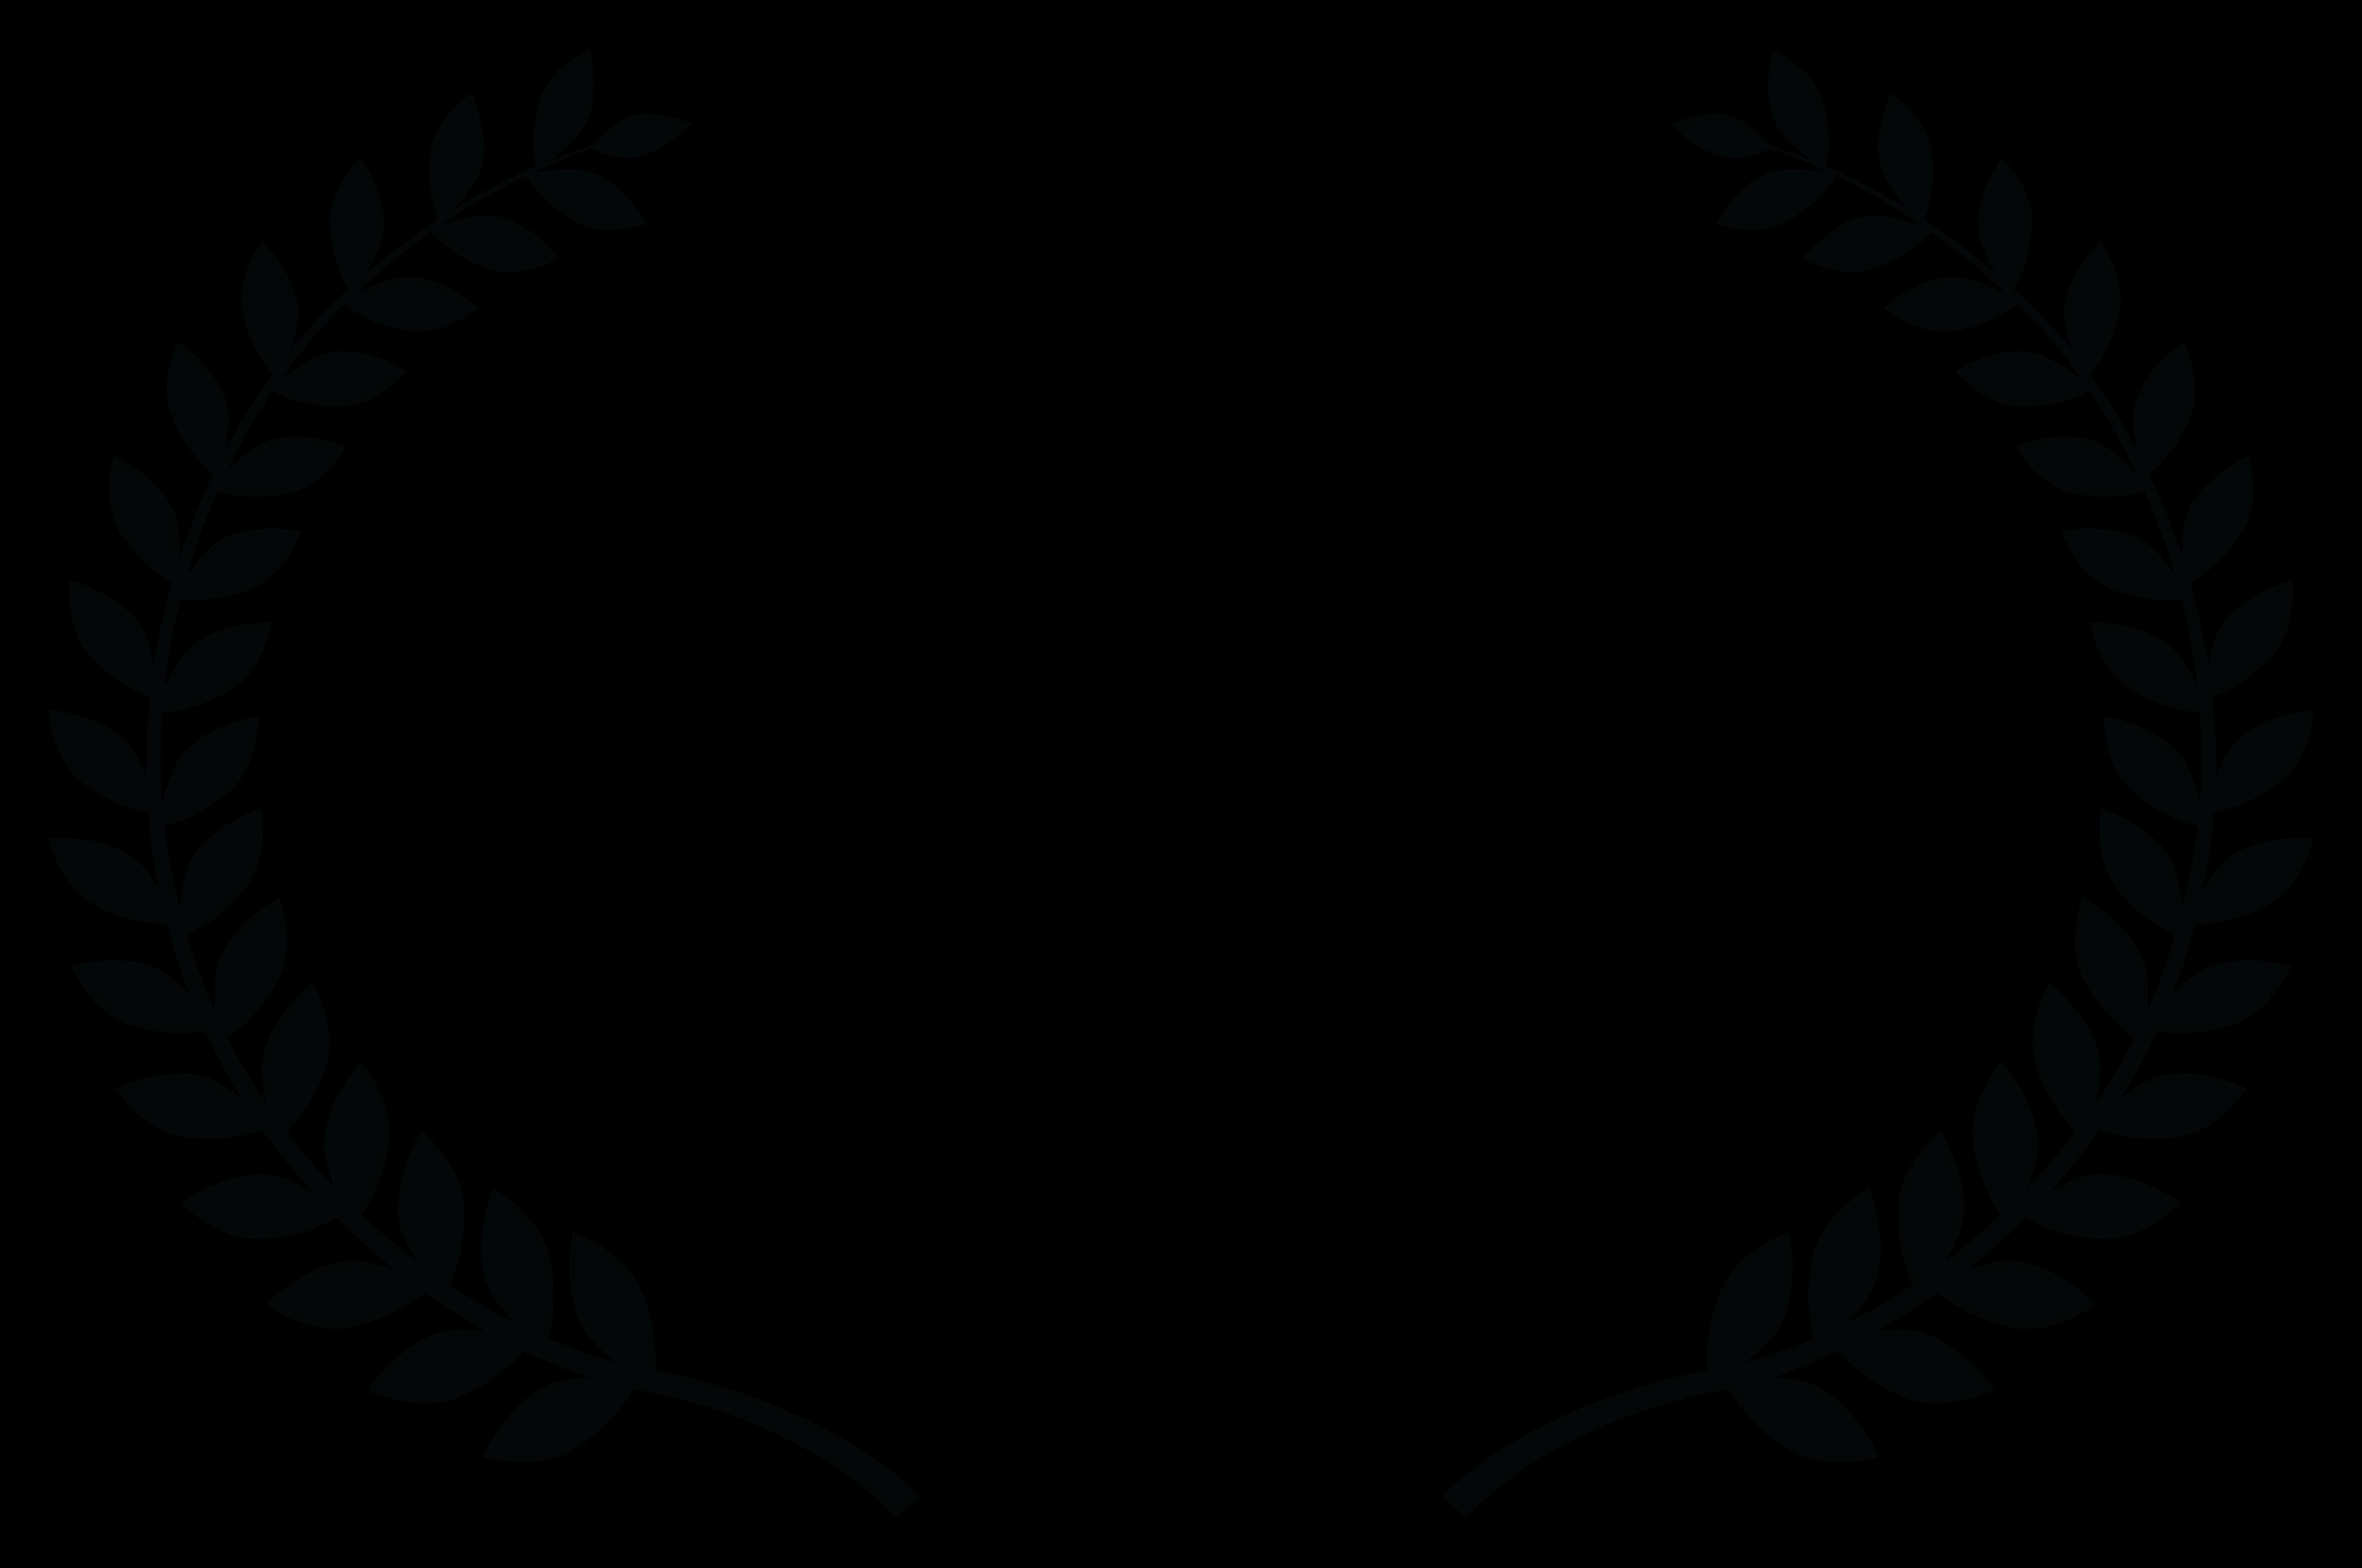 OFFICIALSELECTION-TuzlaFilmFestival-2017